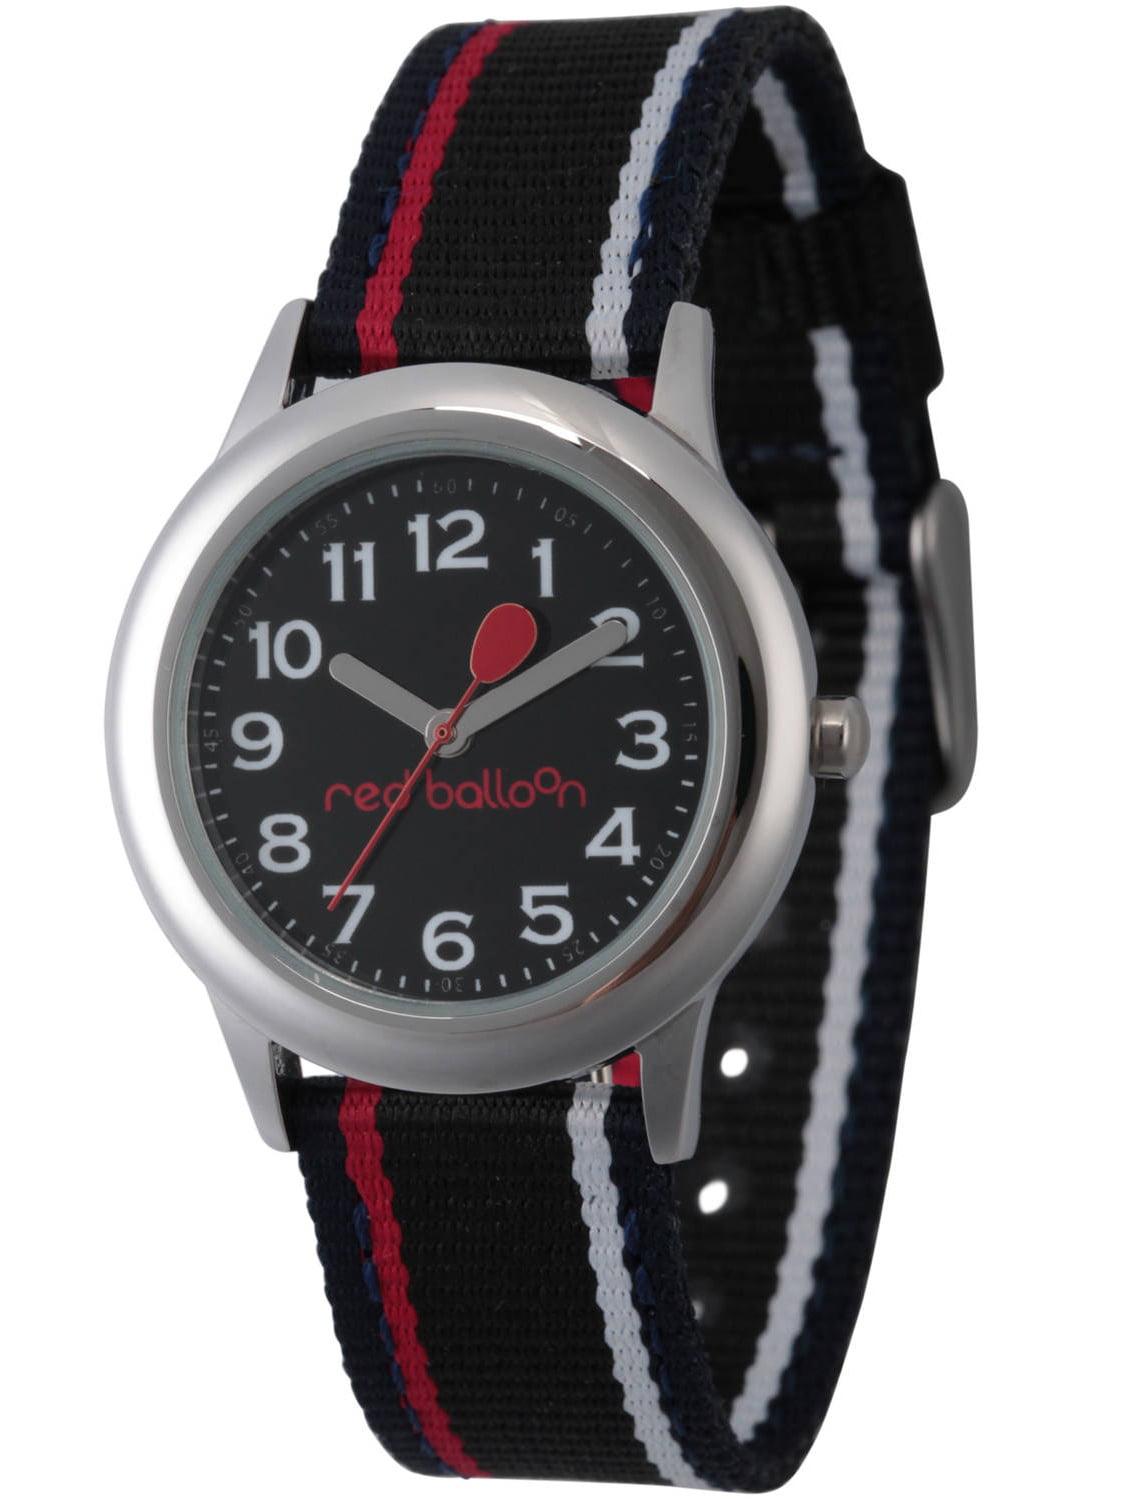 Boys' Stainless Steel Watch, Black Nylon Strap